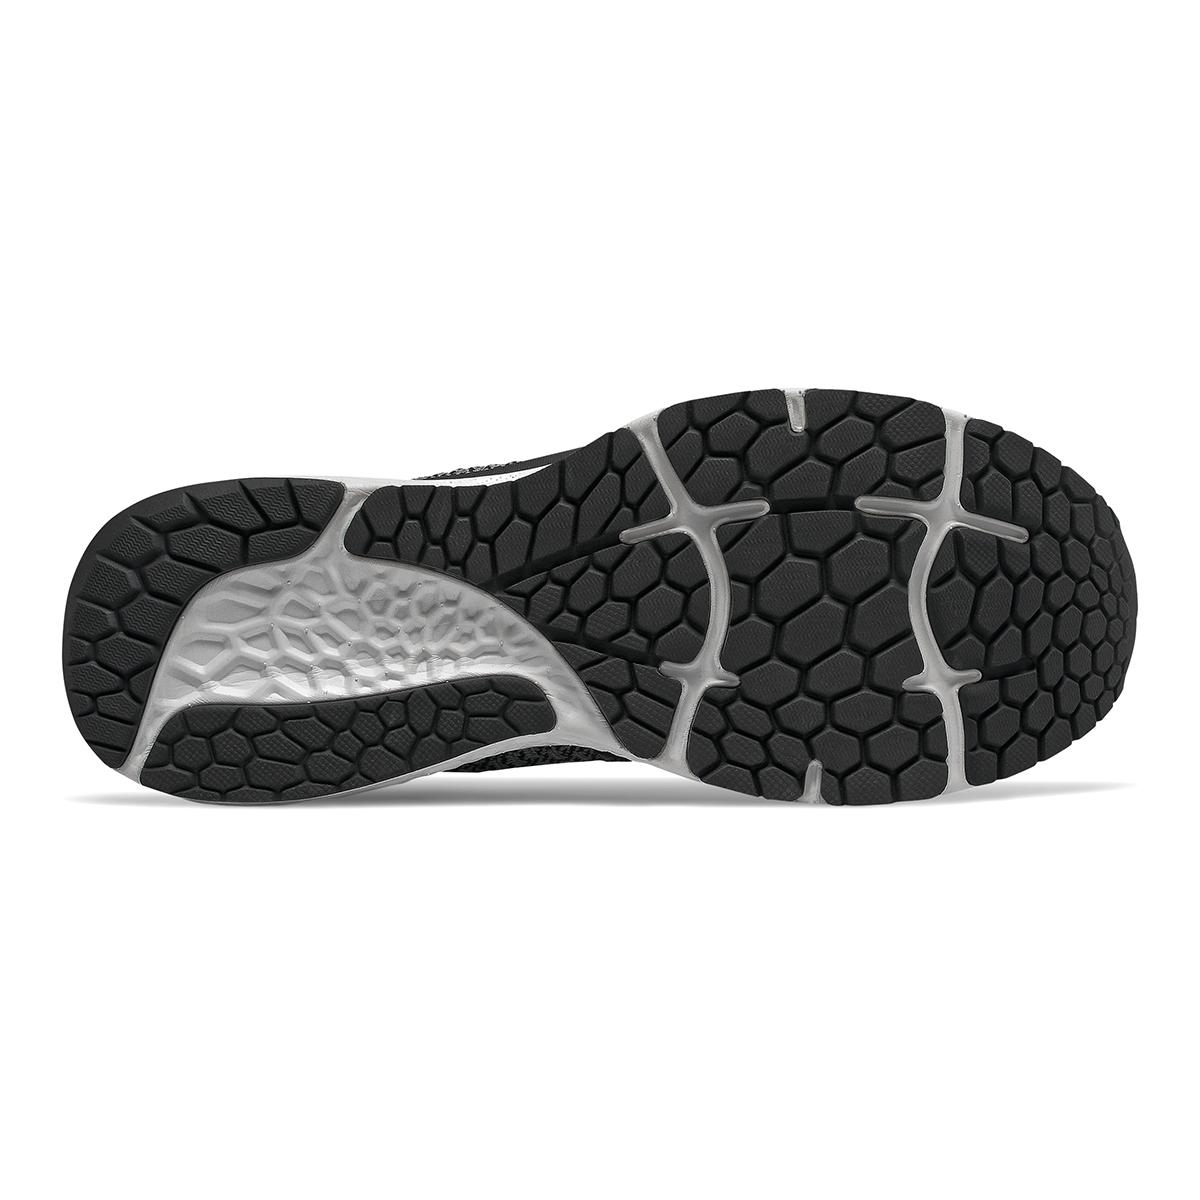 Men's New Balance 880v10 Running Shoe - Color: Black / White   (Regular Width) - Size: 10.5, Black / White, large, image 3